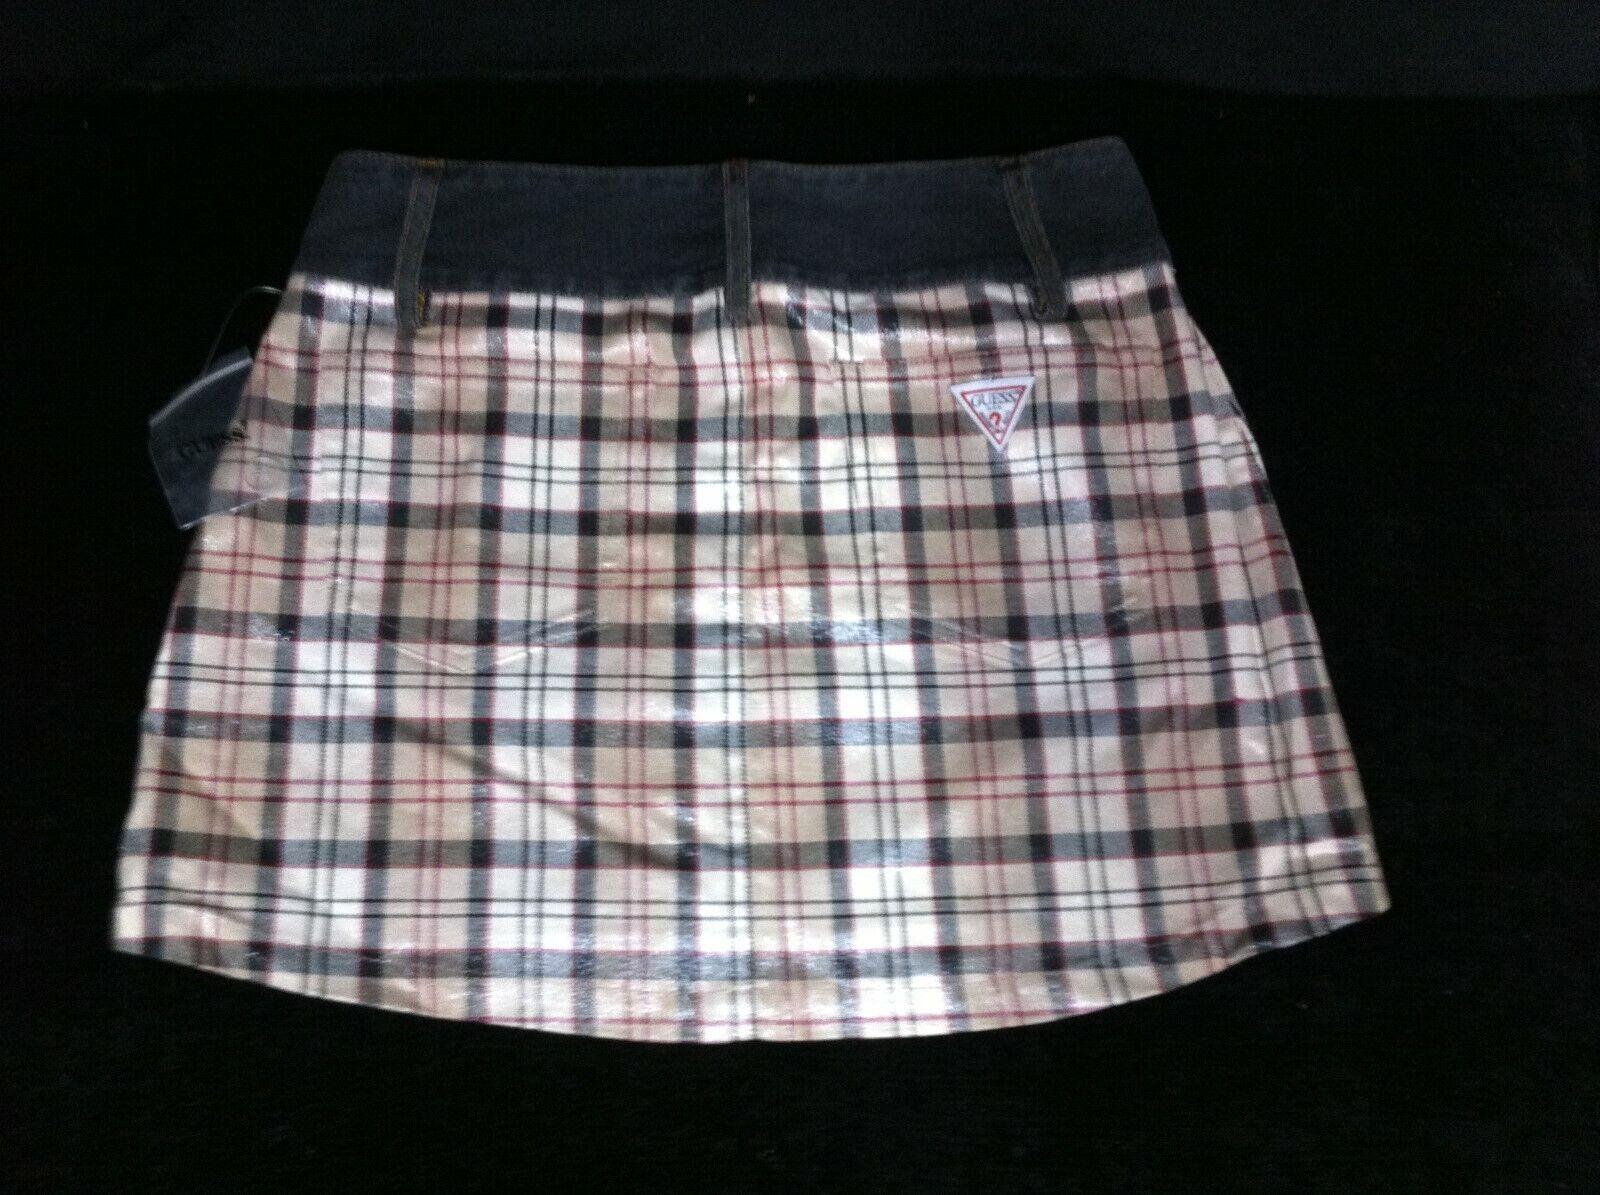 NEW Vintage 1990s GUESS JEANS Mini Wrap Around Skirt Denim & Plaid Jrs Womens 28